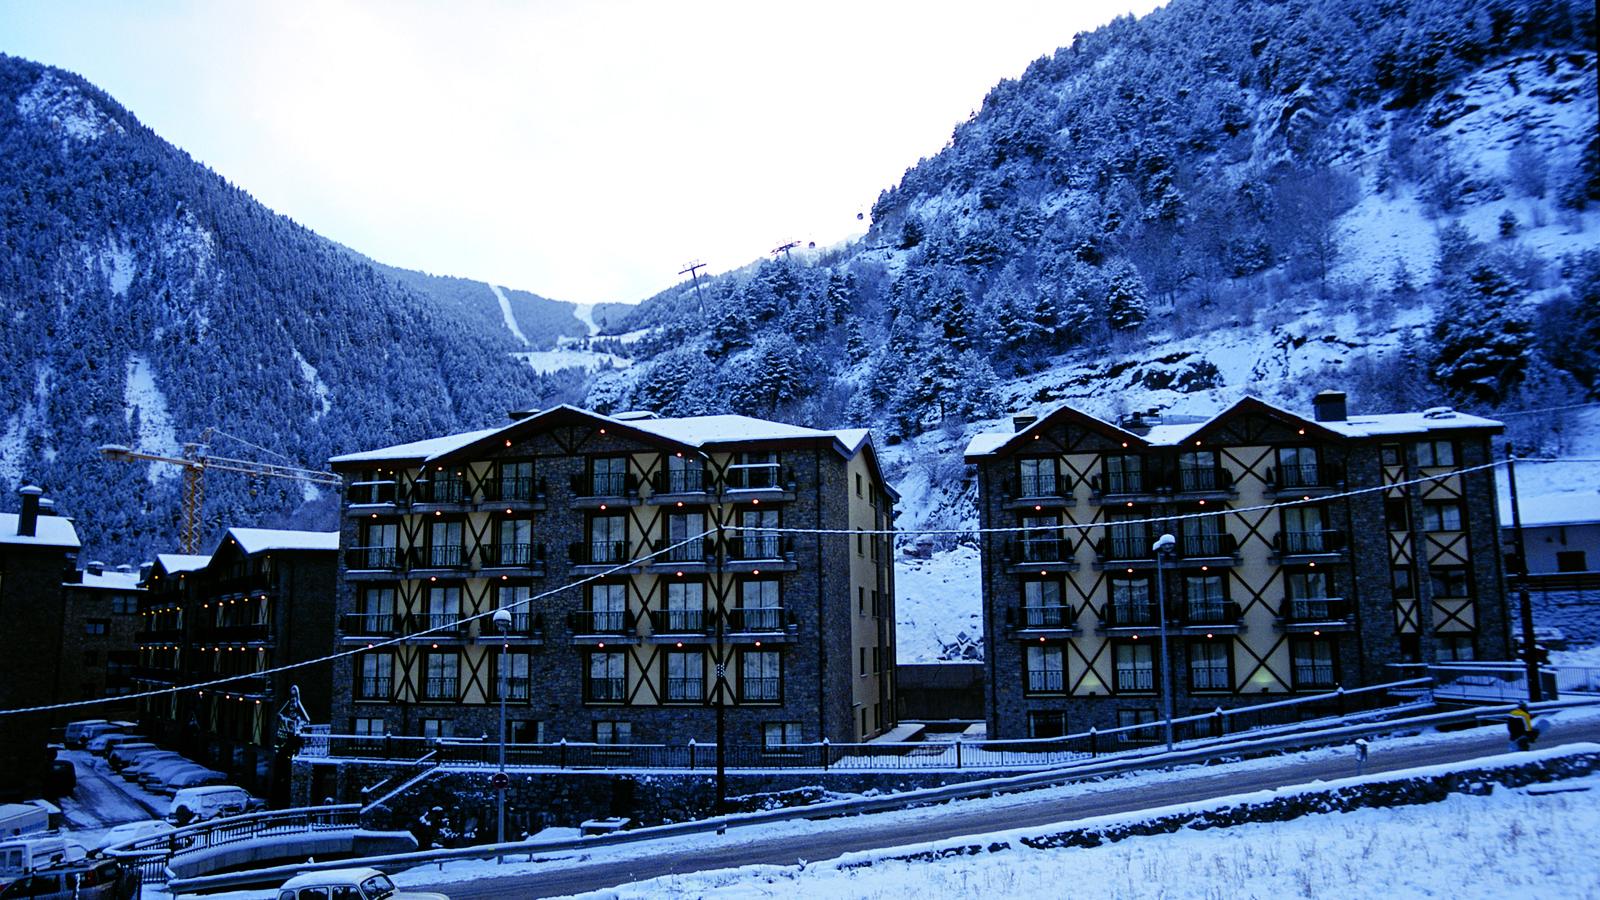 Arinsal Andorra  city pictures gallery : Ski Andorra Arinsal & Pal Hotel Princesa Parc Ski Holidays 2013 ...